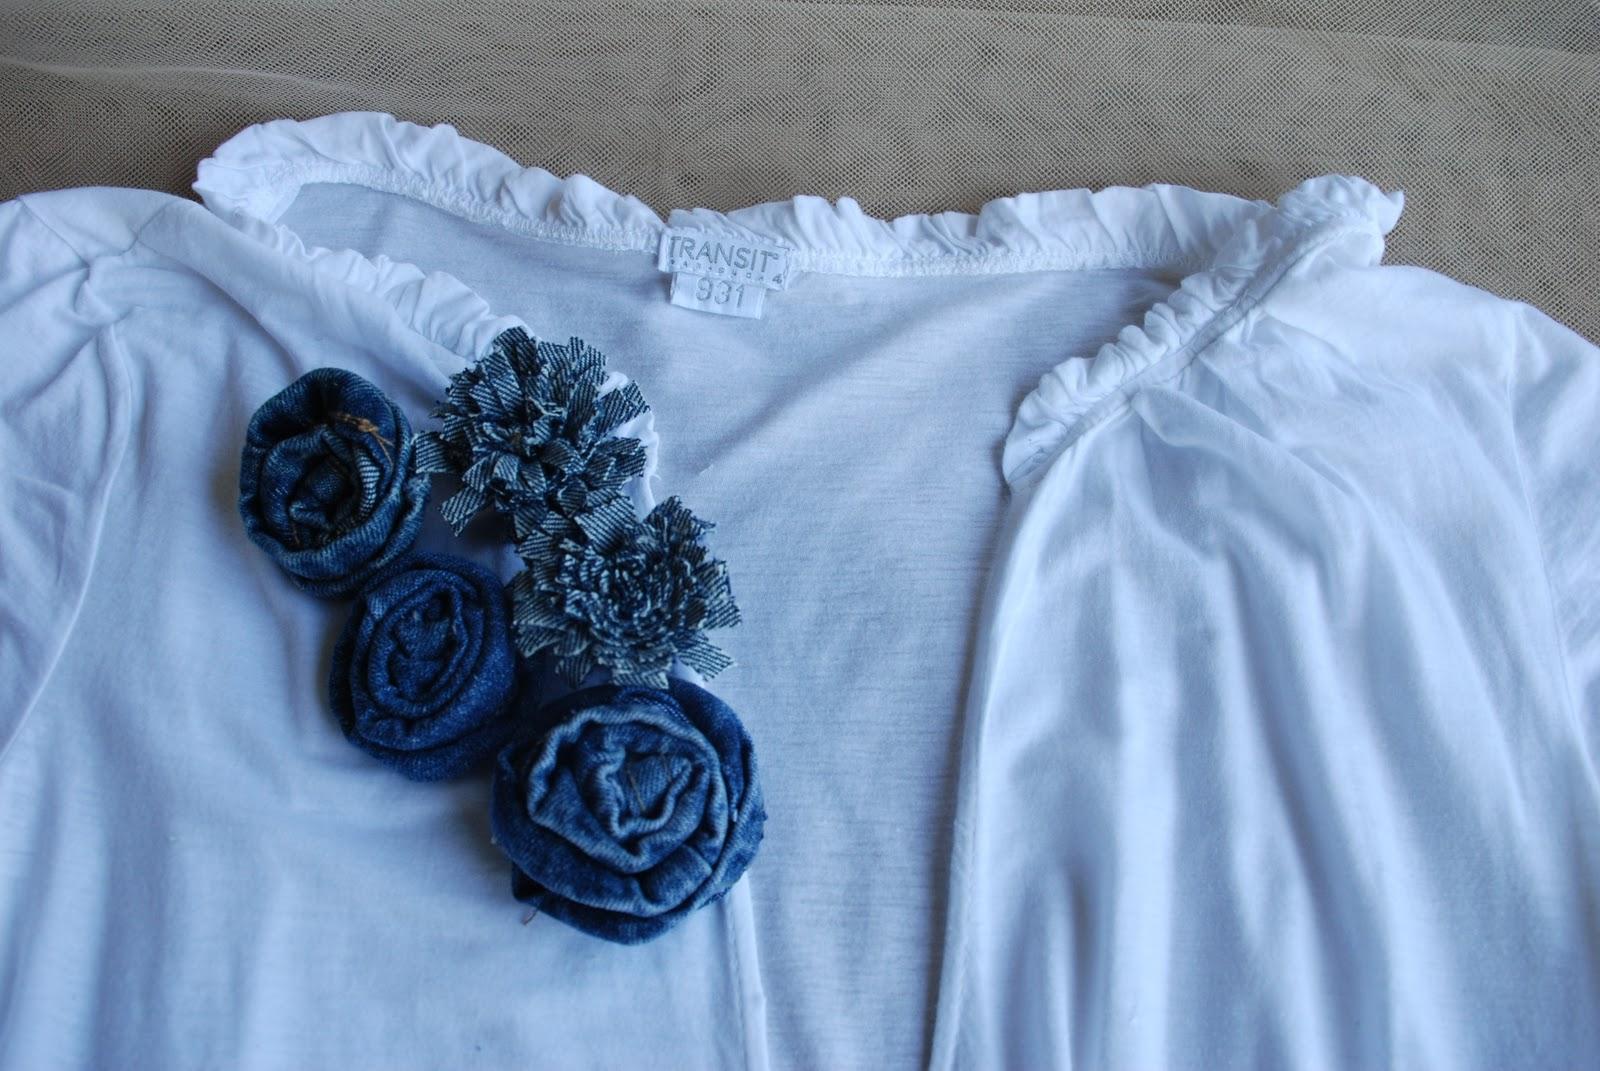 Mamolicas customizar ropa flores tela de vaqueros - Decorar pantalones vaqueros ...